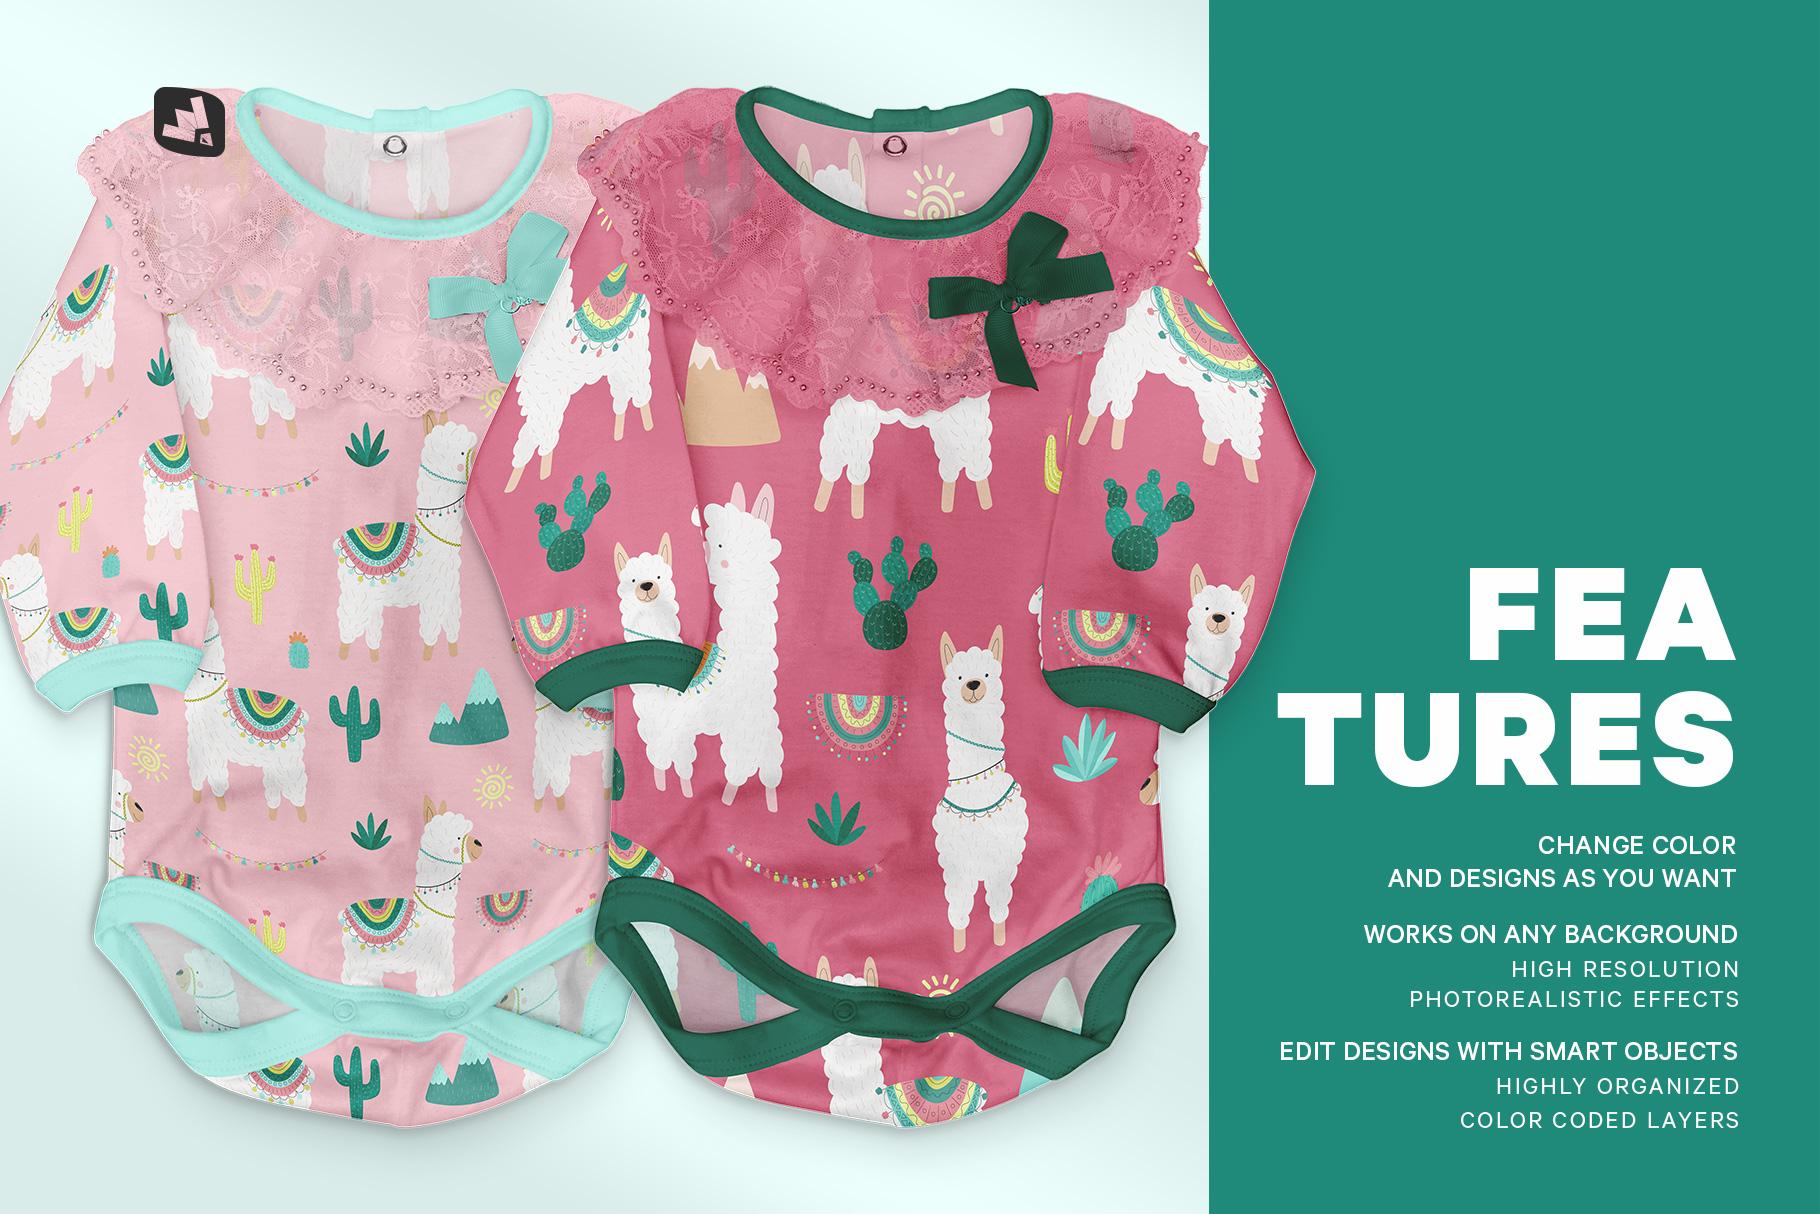 features of the baby girl's onesie mockup